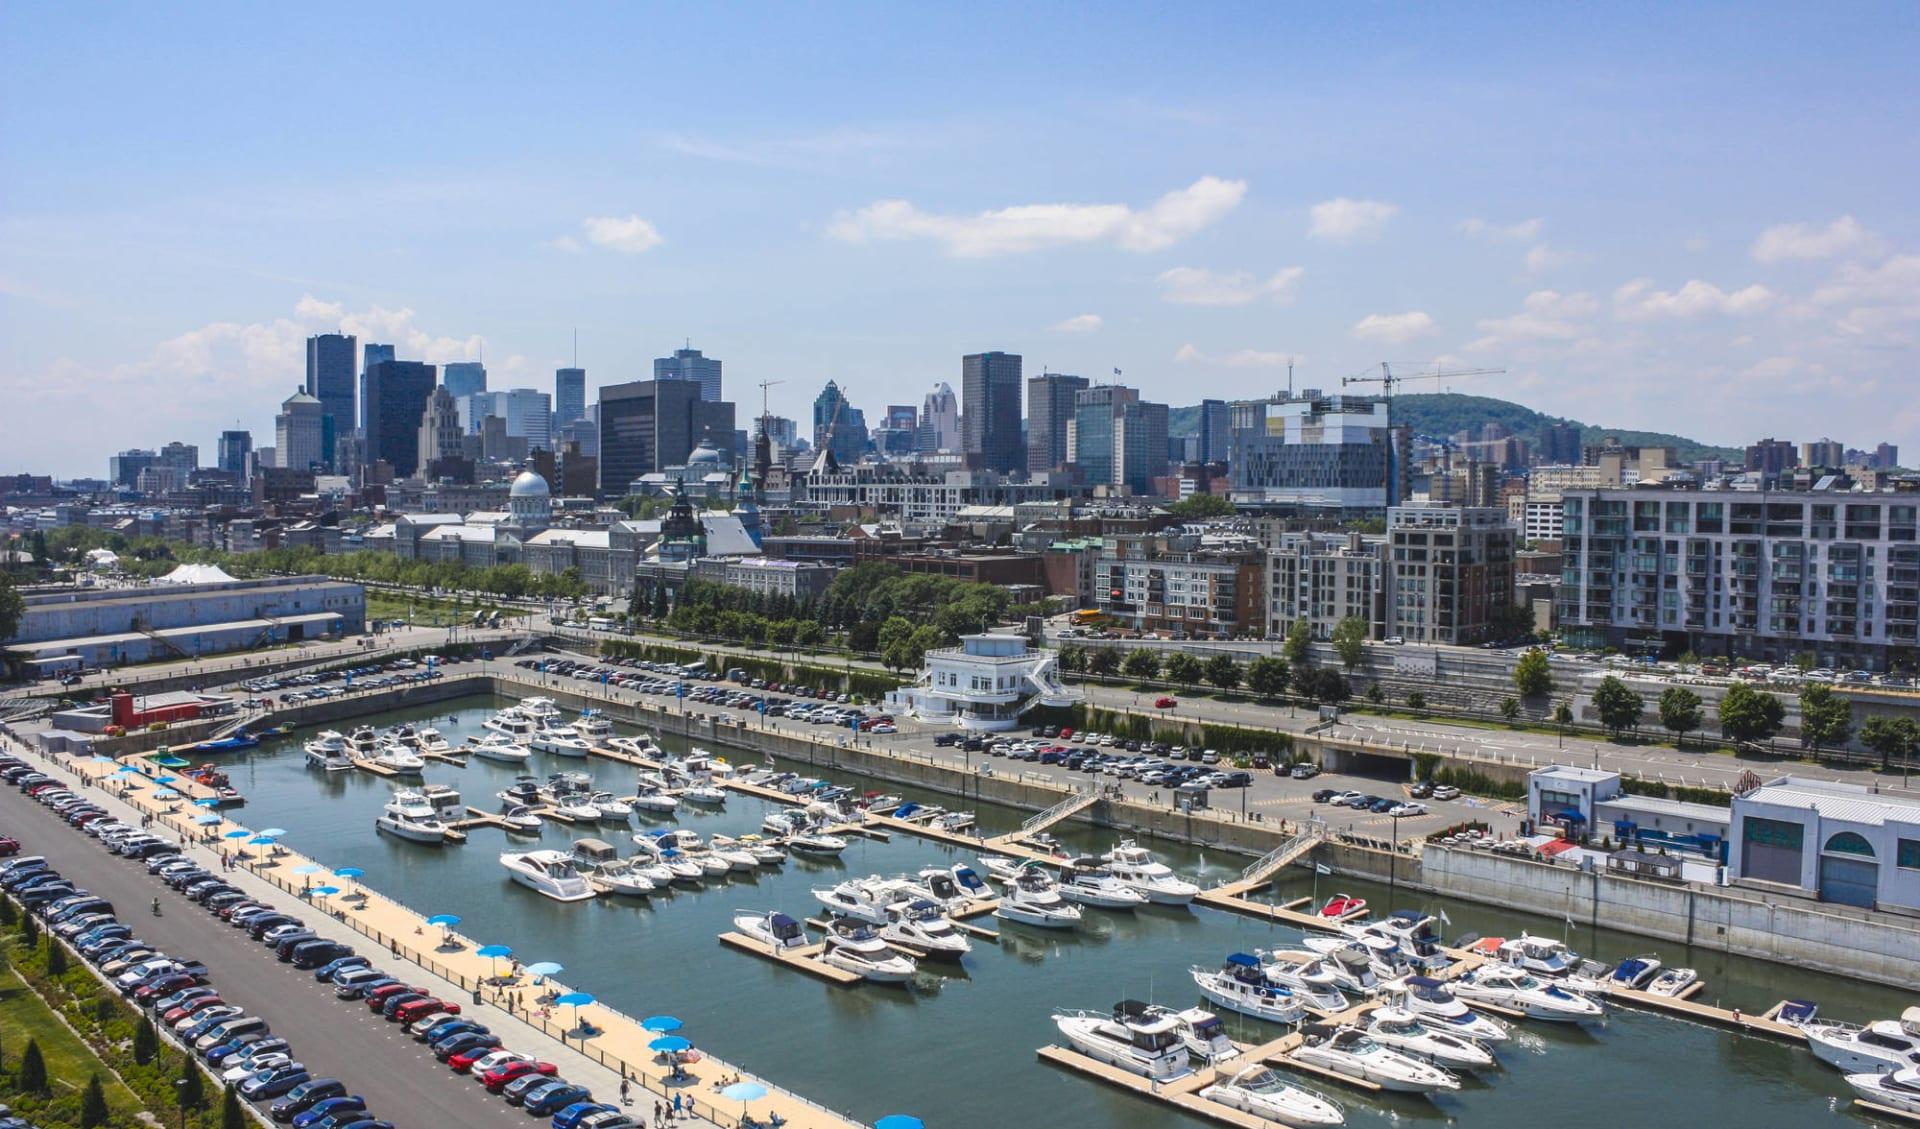 Kanadische Kontraste ab Toronto: Kanada - Montreal - Old Port Downtown